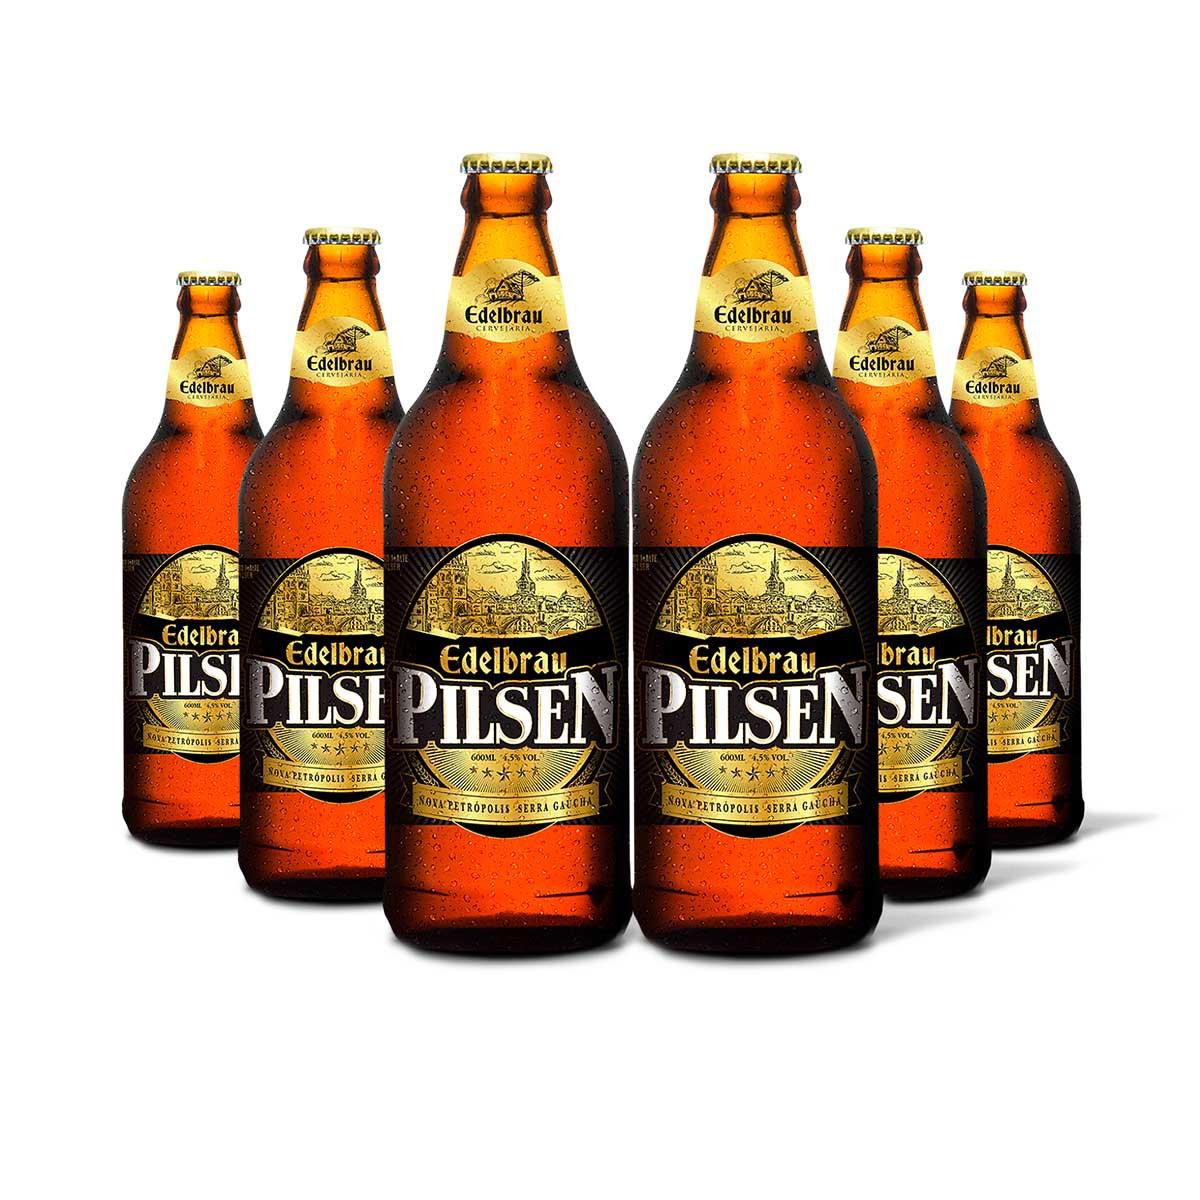 Pack Edelbrau Pilsen 6 cervejas 600ml